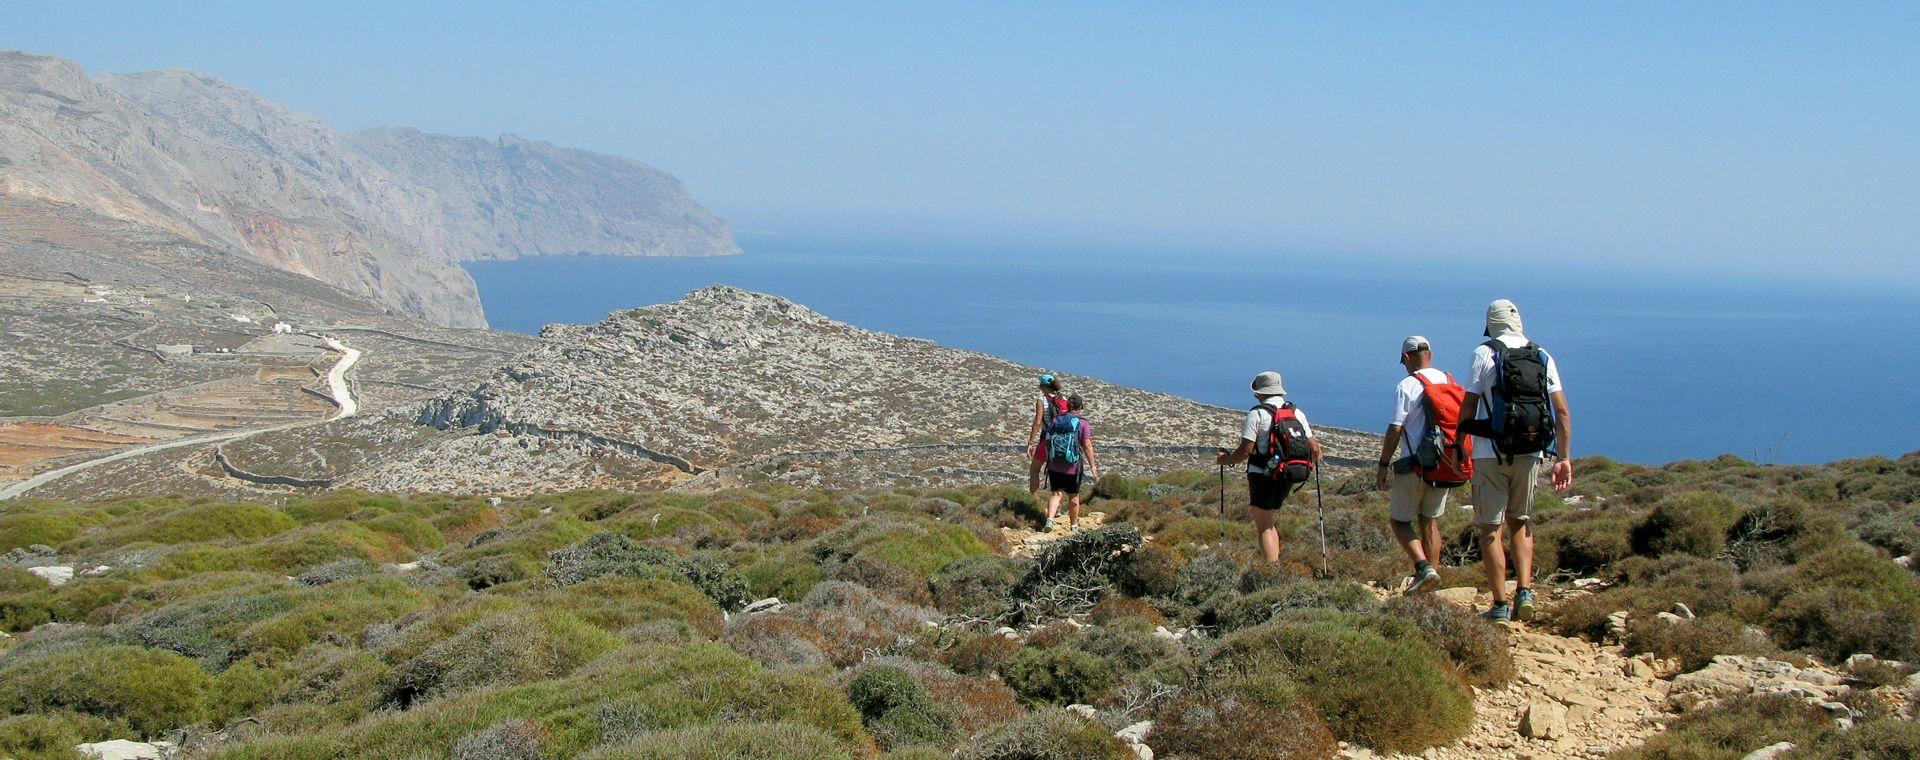 Image Les Cyclades : Naxos et Amorgos